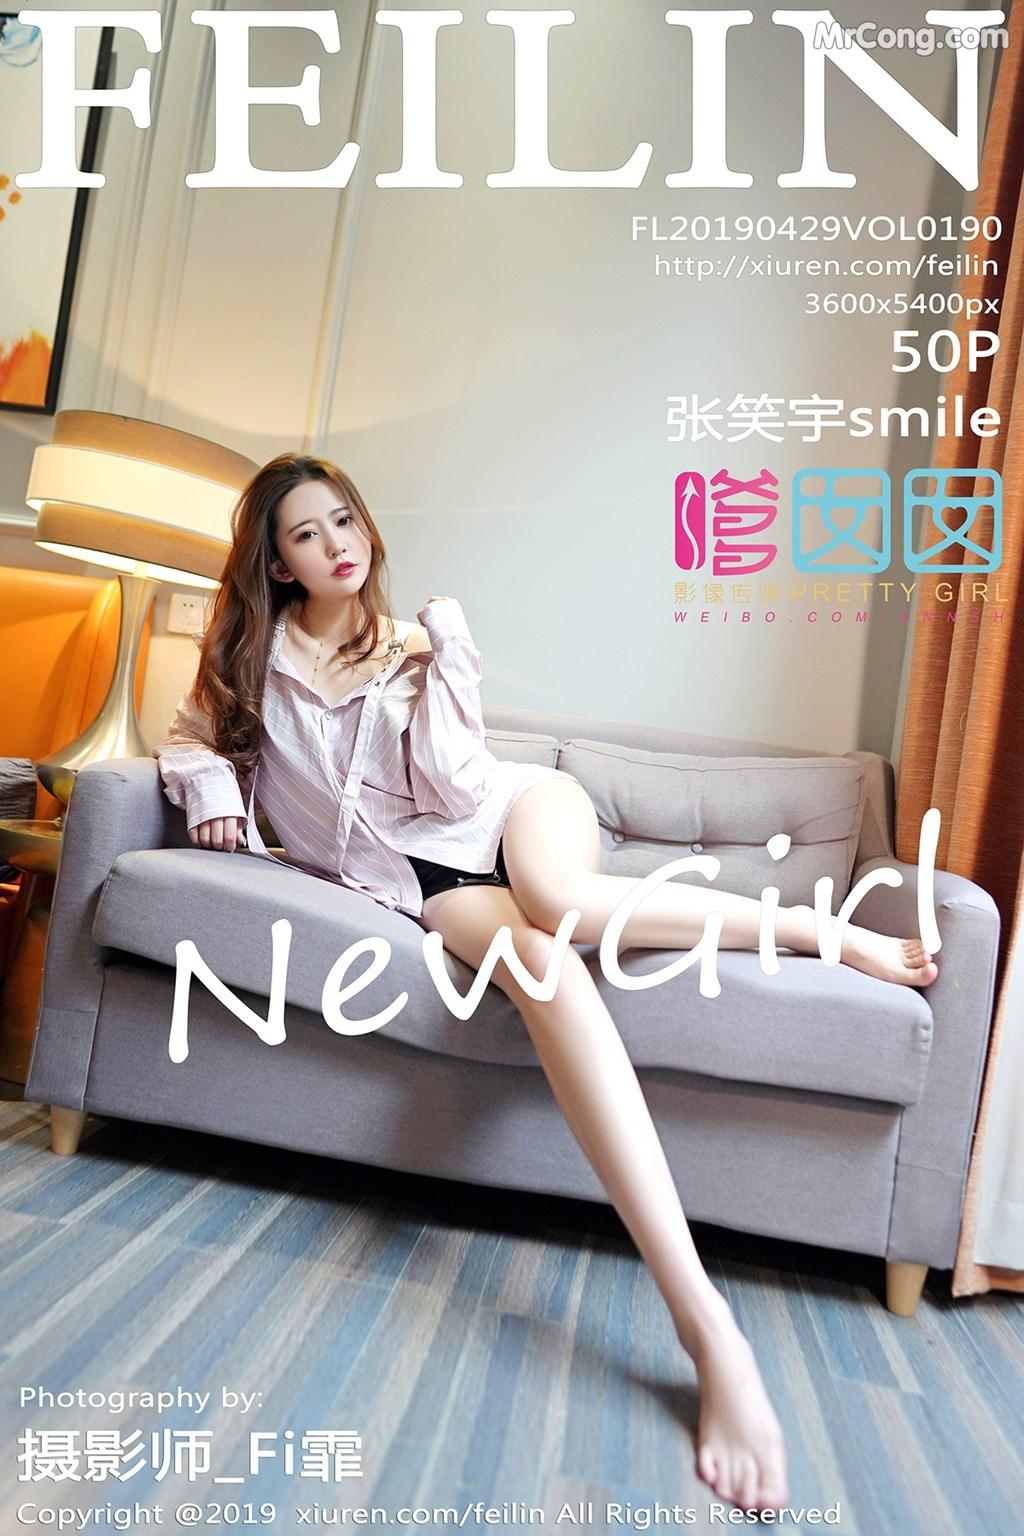 FEILIN Vol.190: 张笑宇 smile (51 pictures)